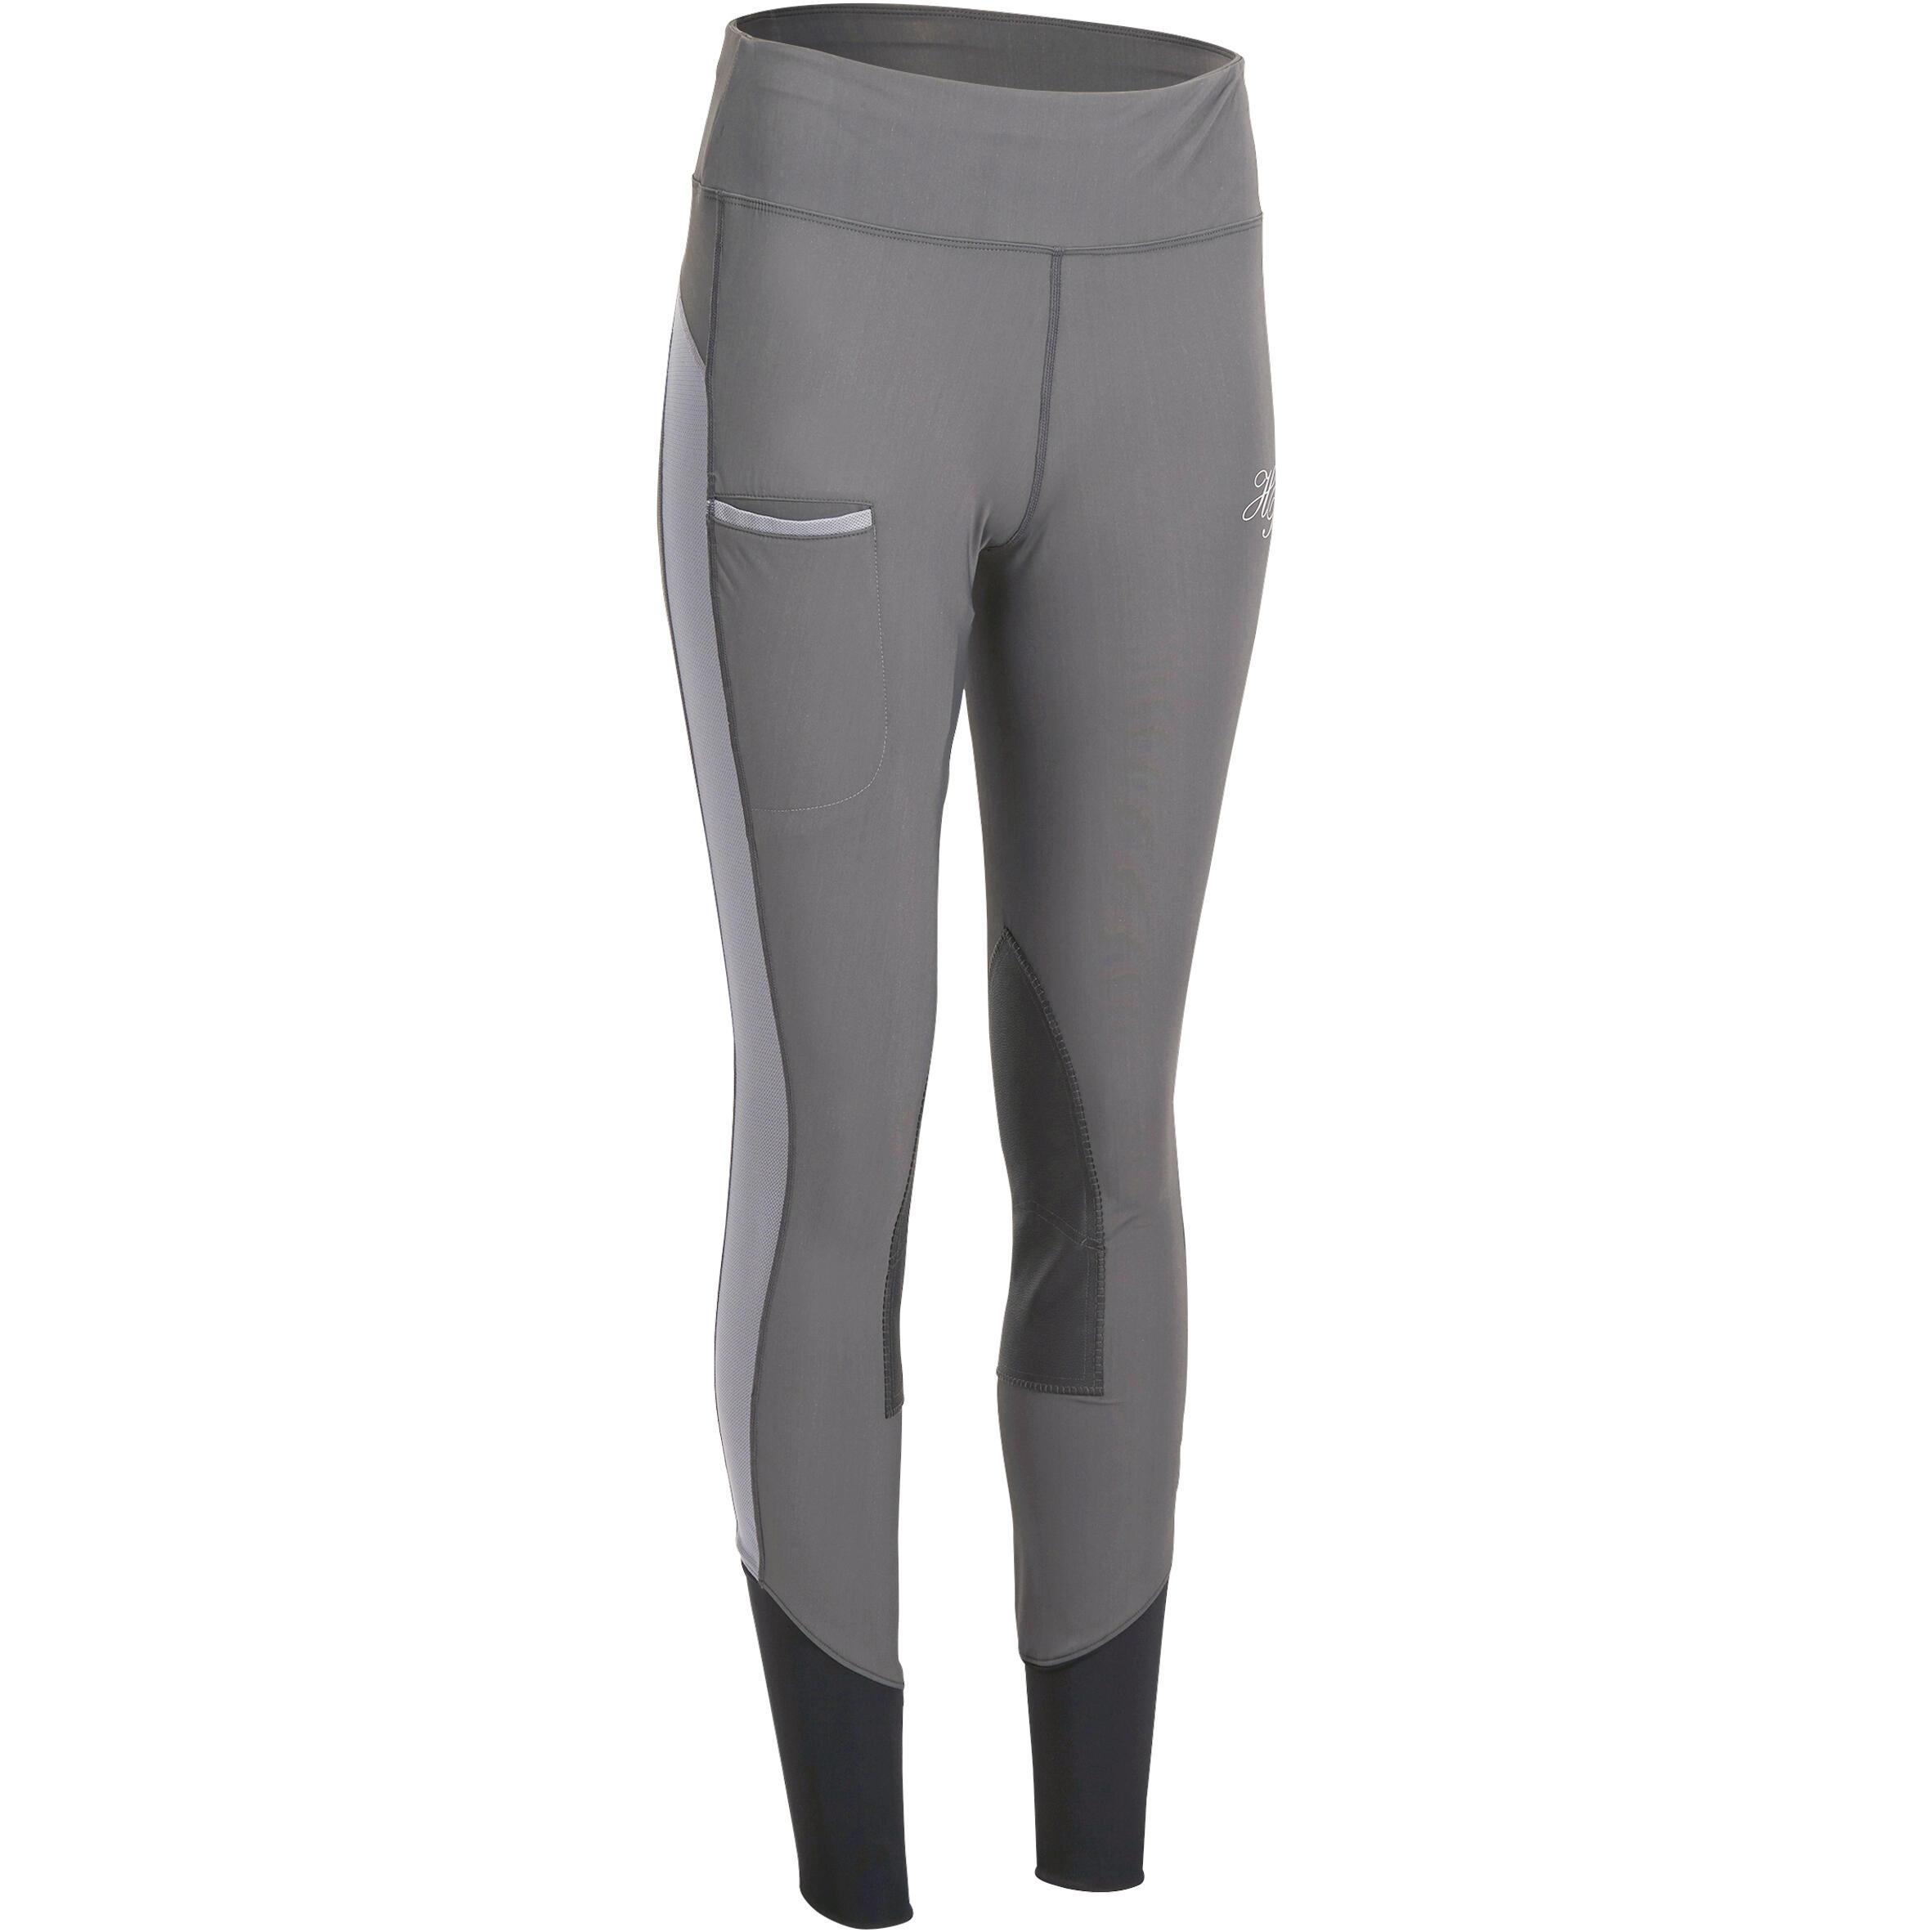 pantalon-equitation-femme-br140-leger-gris-fonce.jpg 9df472b5ceb